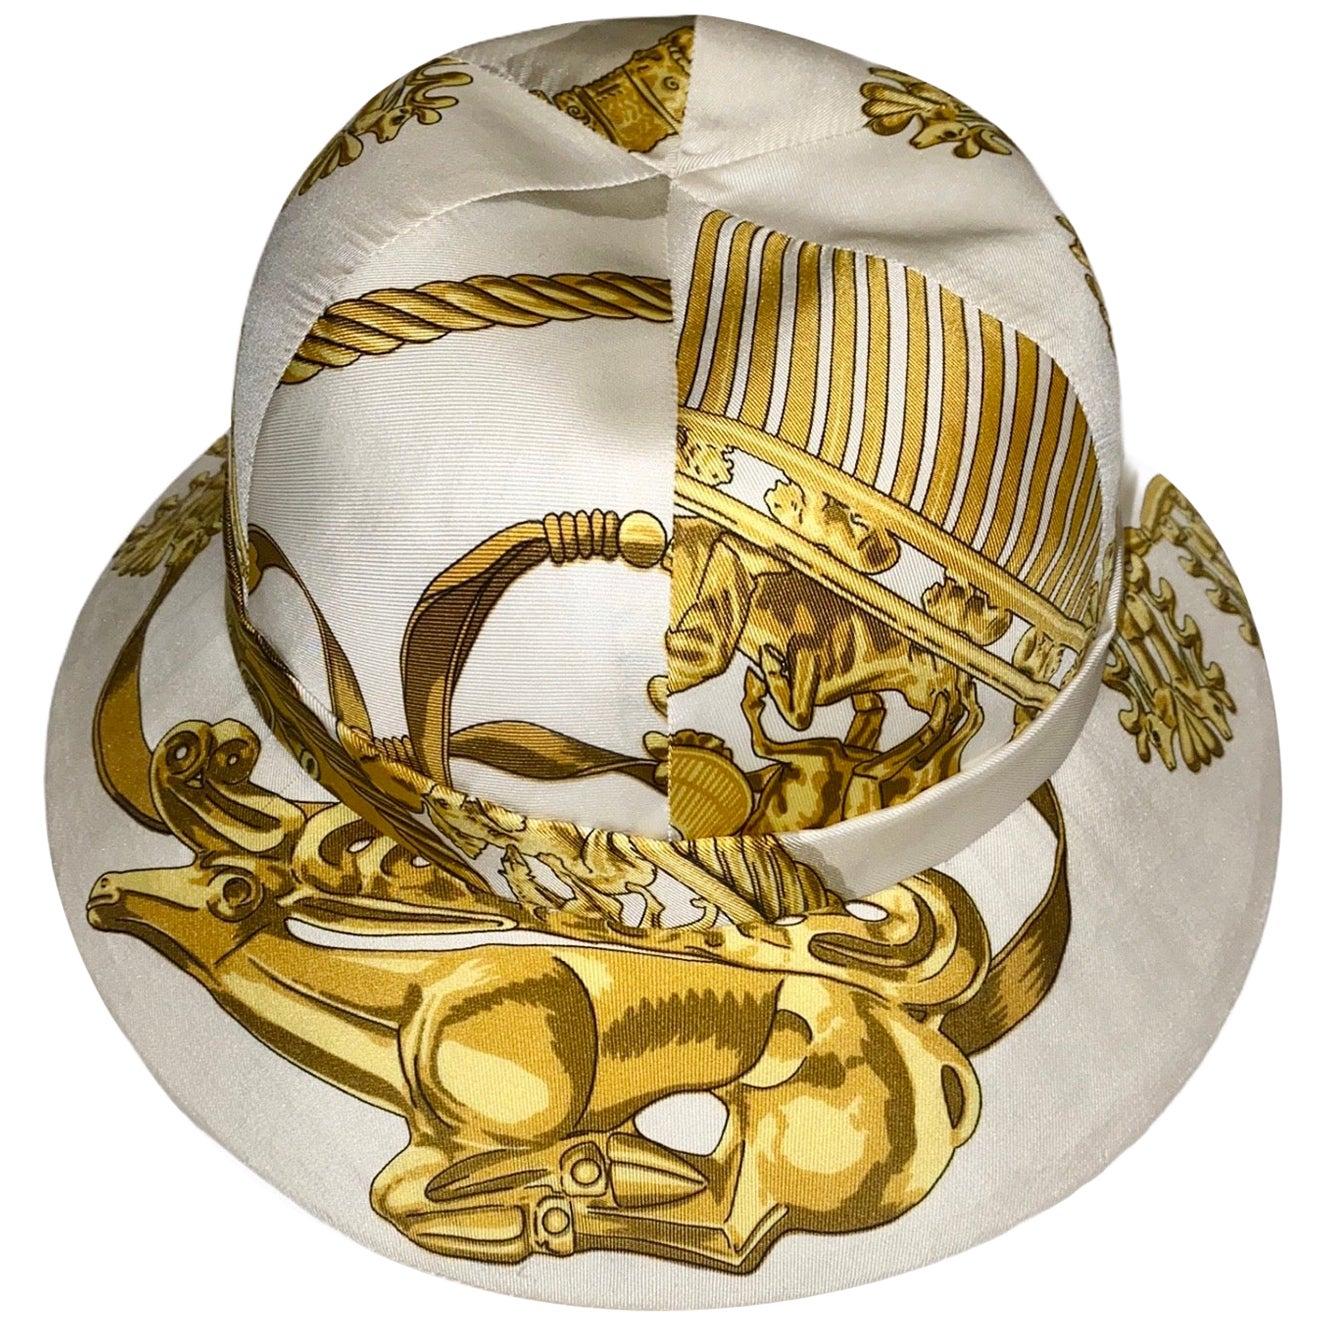 "Unique HERMES Printed Silk Structured Safari Hat ""Cavaliers d'Or"""